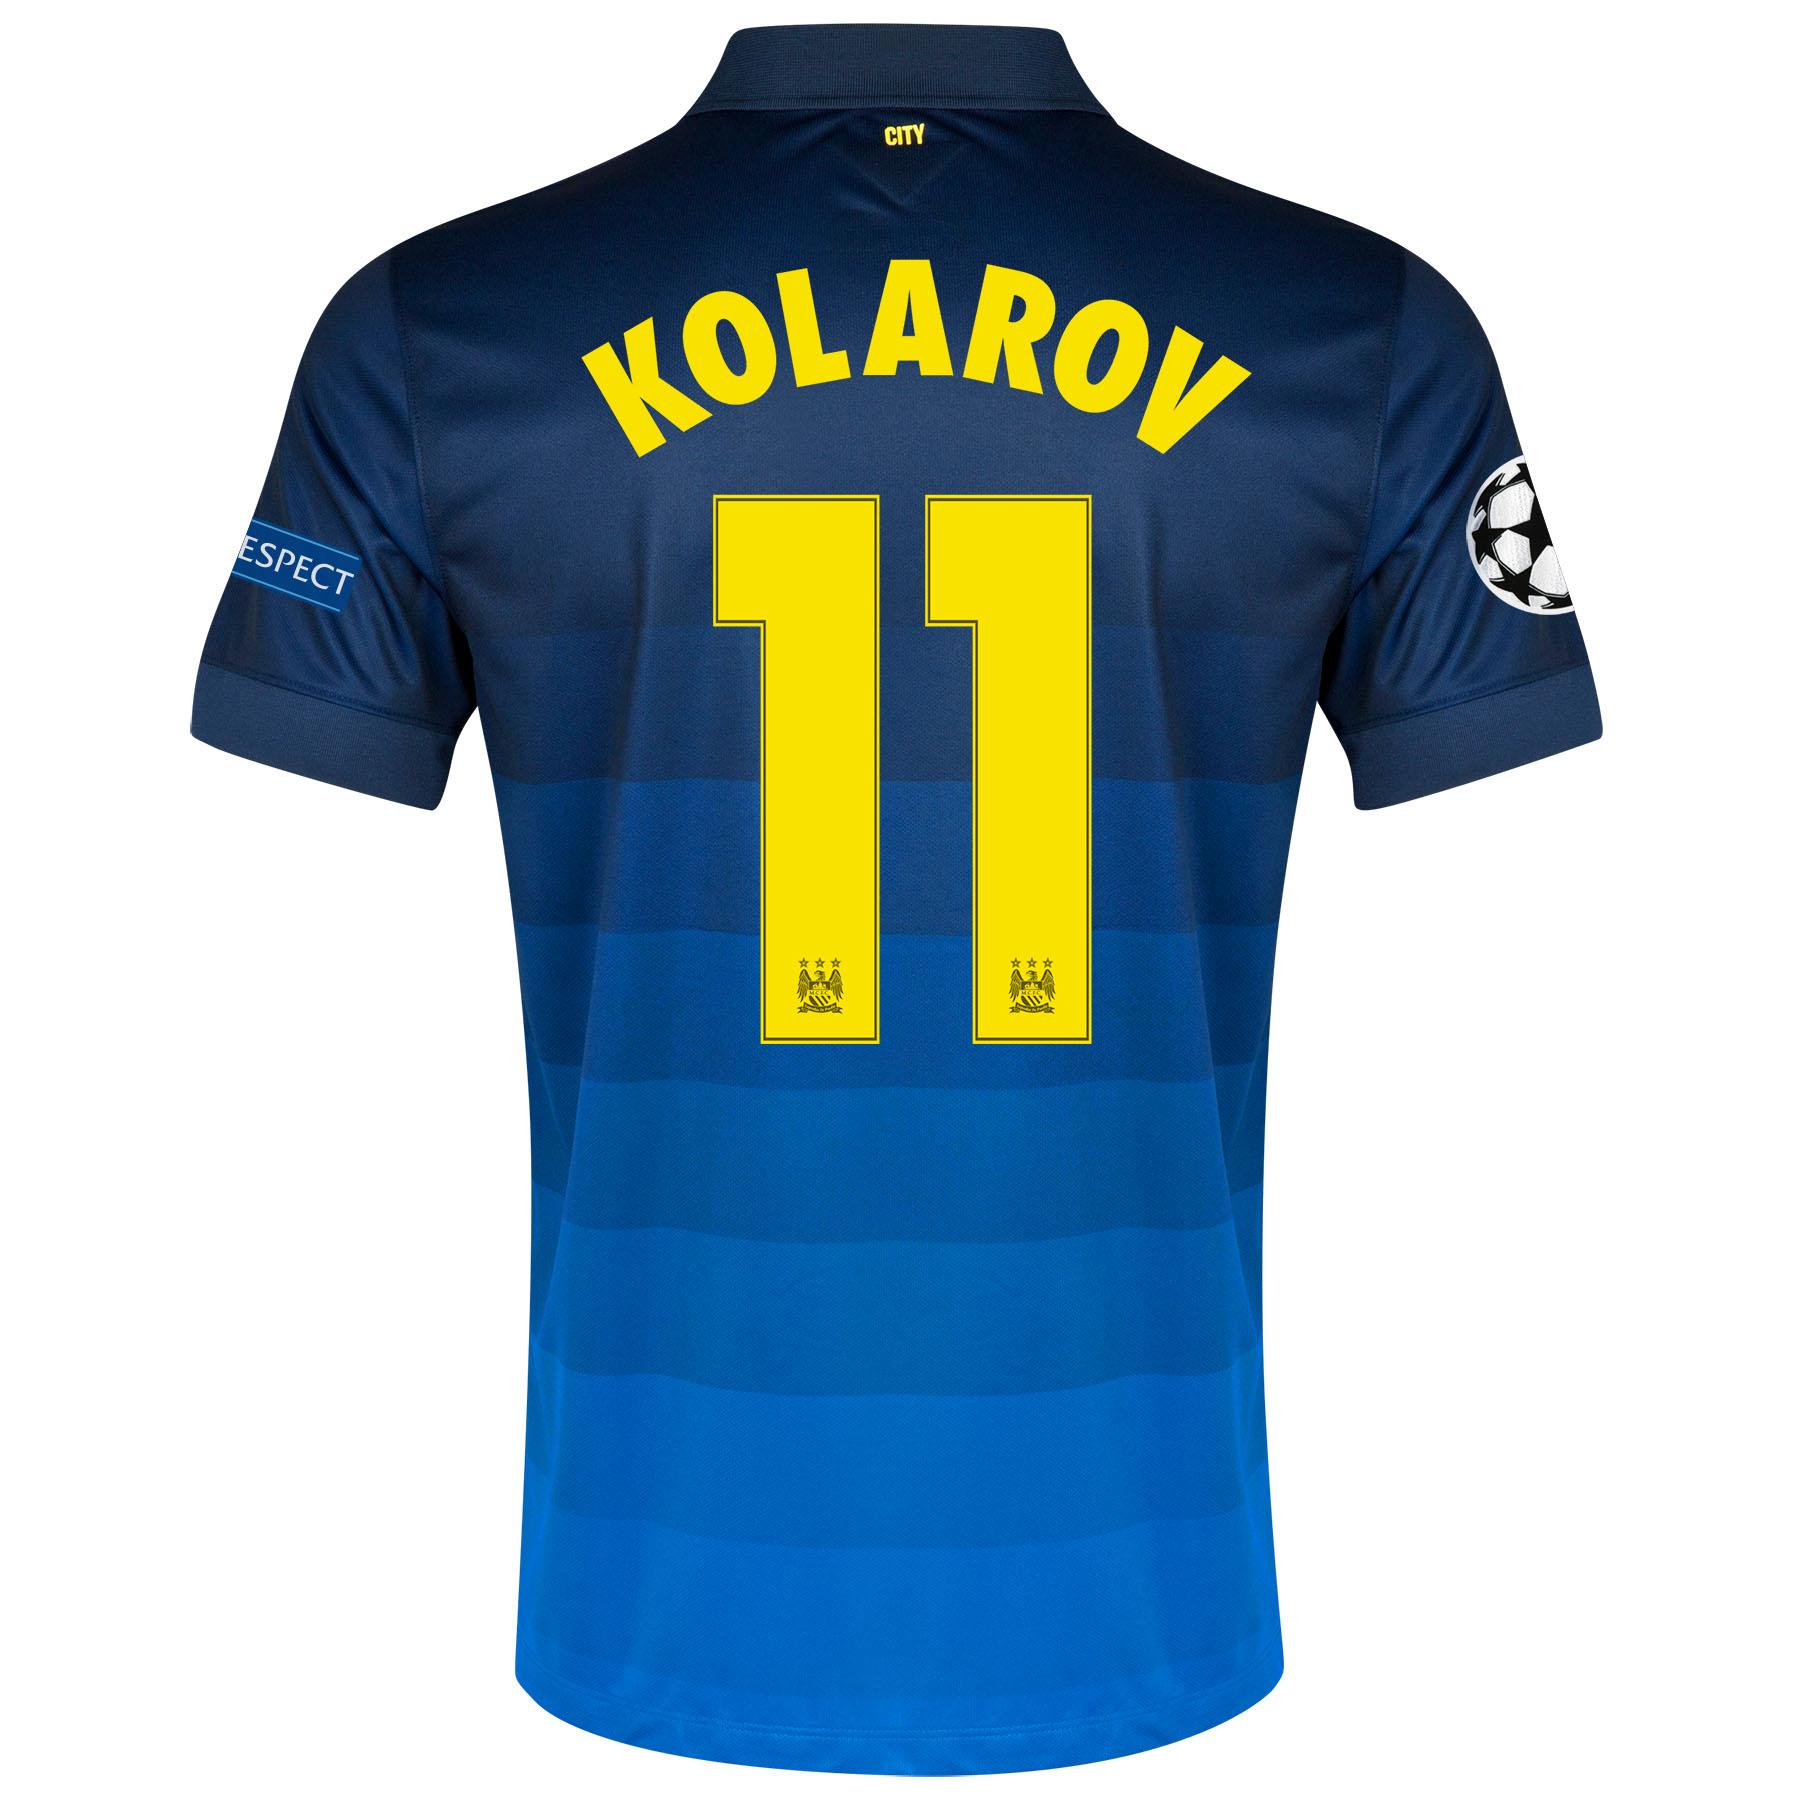 Manchester City UEFA Champions League Away Shirt 2014/15 with Kolarov 11 printing